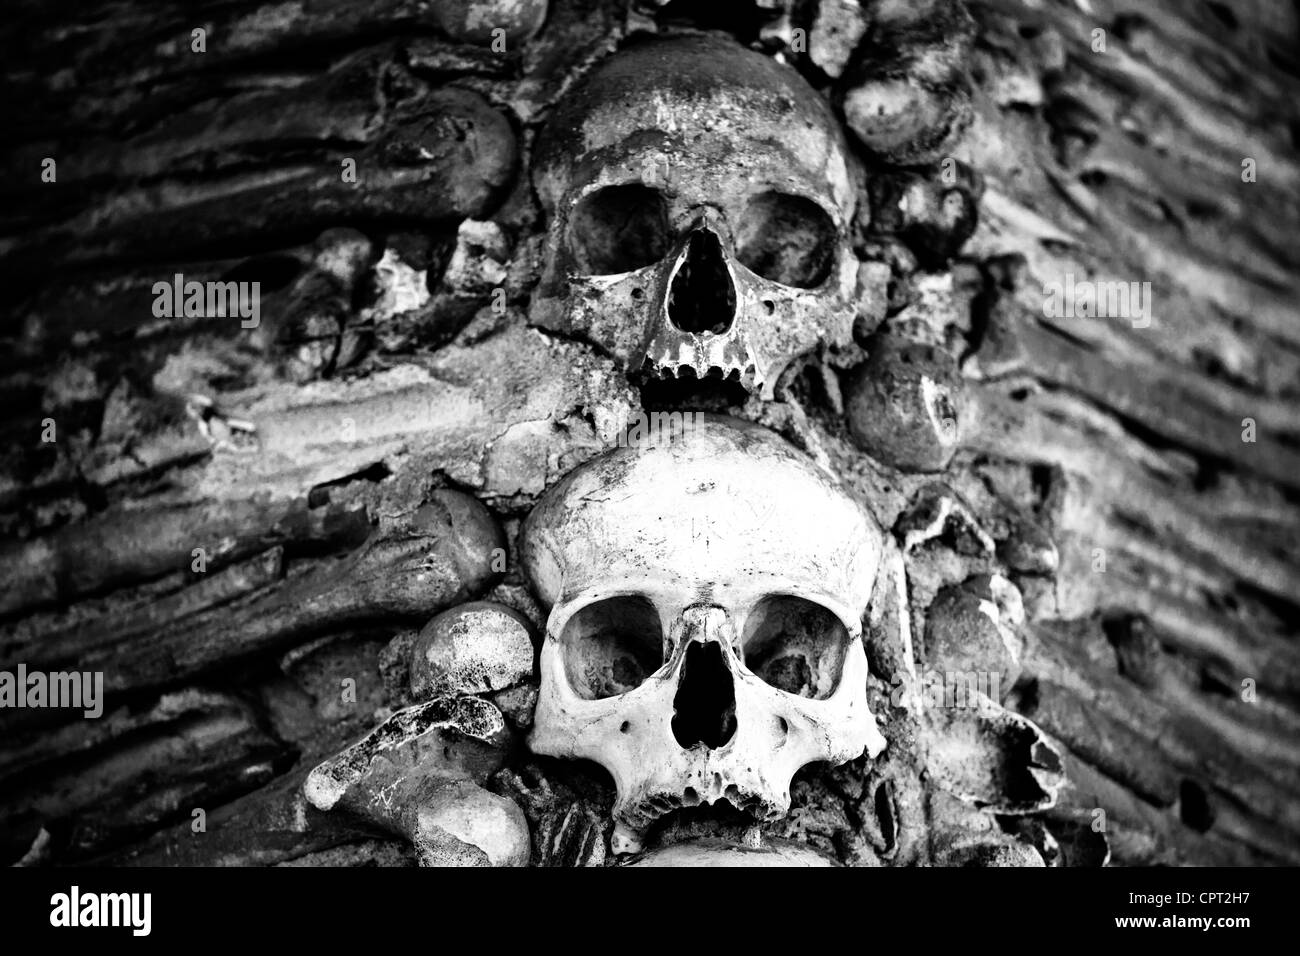 Church of Bones, Evora, Portugal - Stock Image